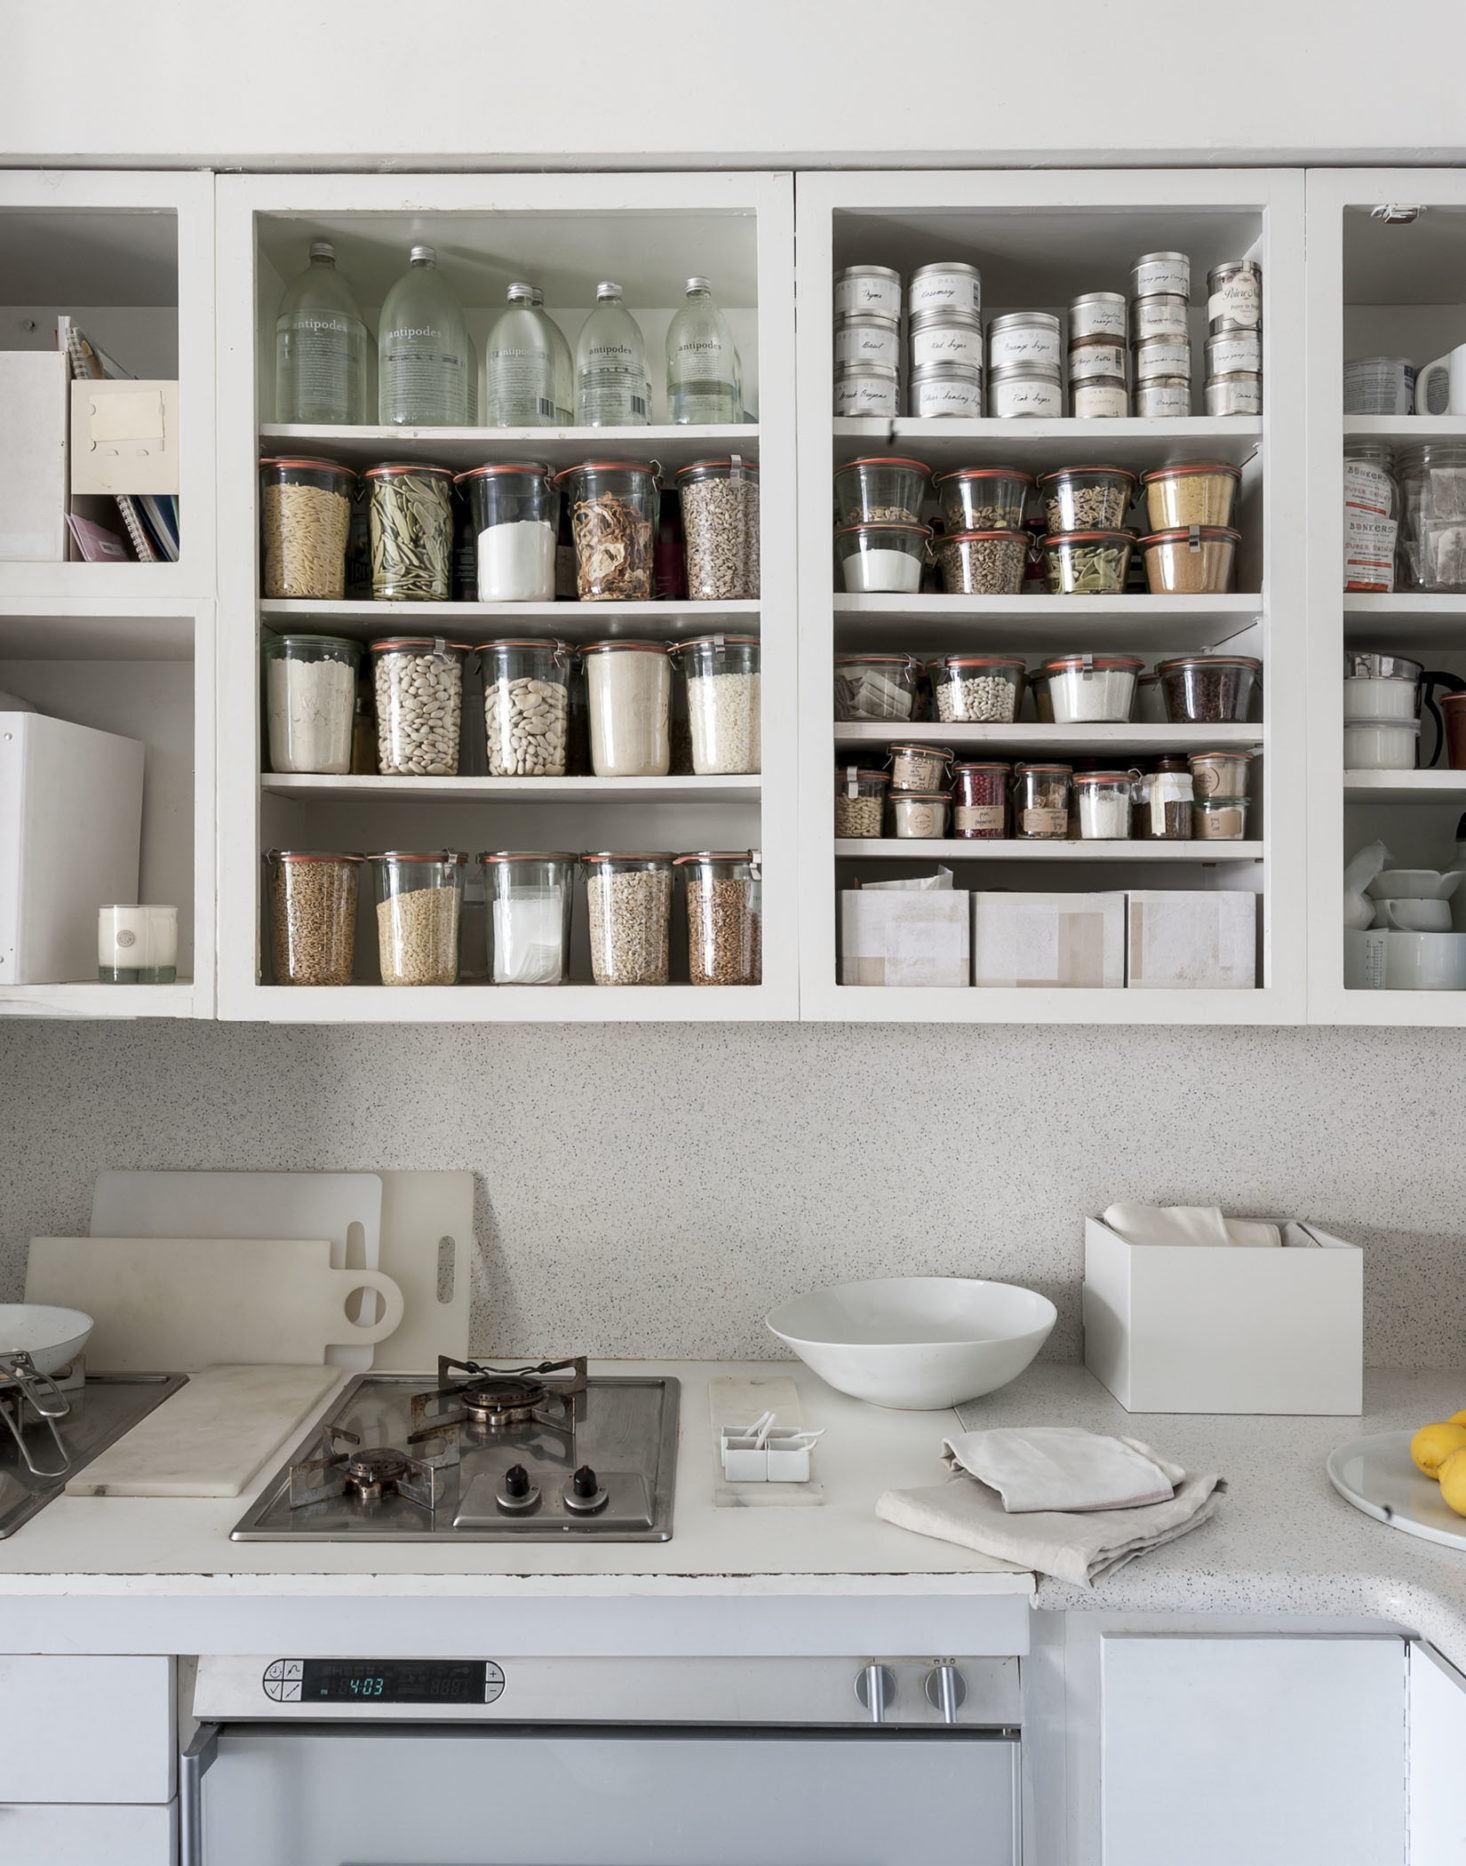 8 Easy Ways To Update Your Kitchen Cabinets Bobby Berk